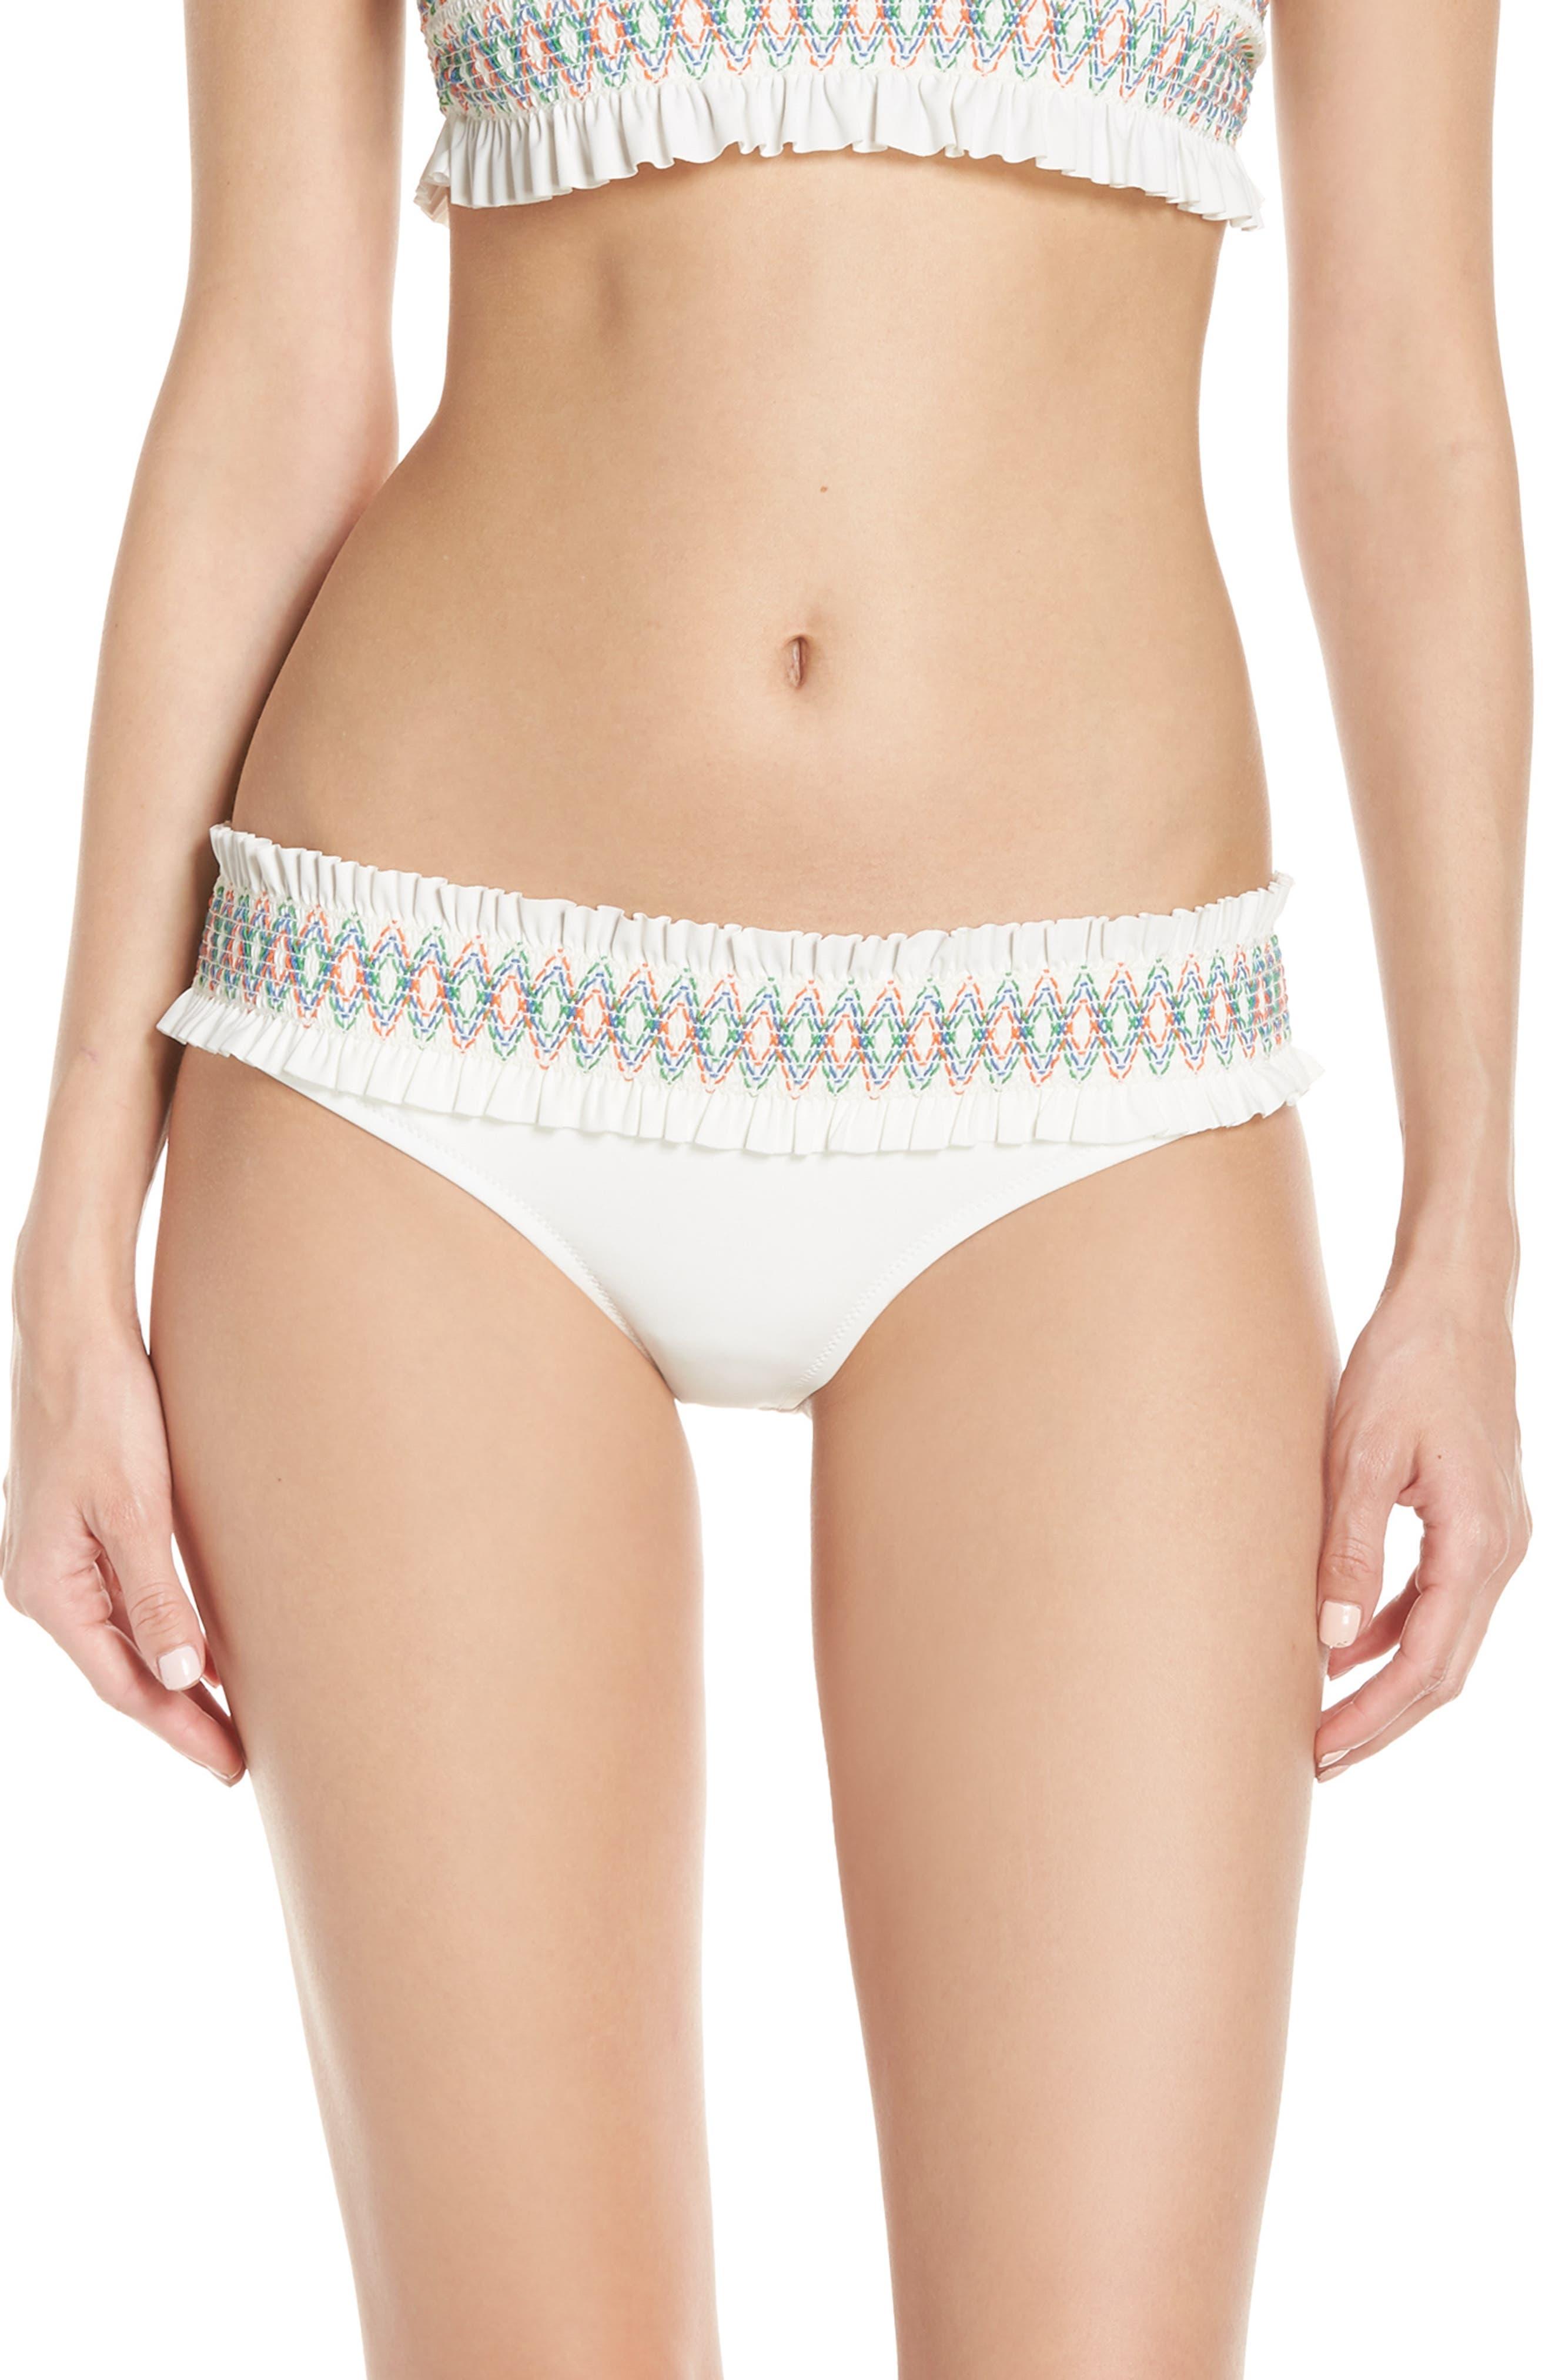 Tory Burch Costa Hipster Bikini Bottoms, Ivory